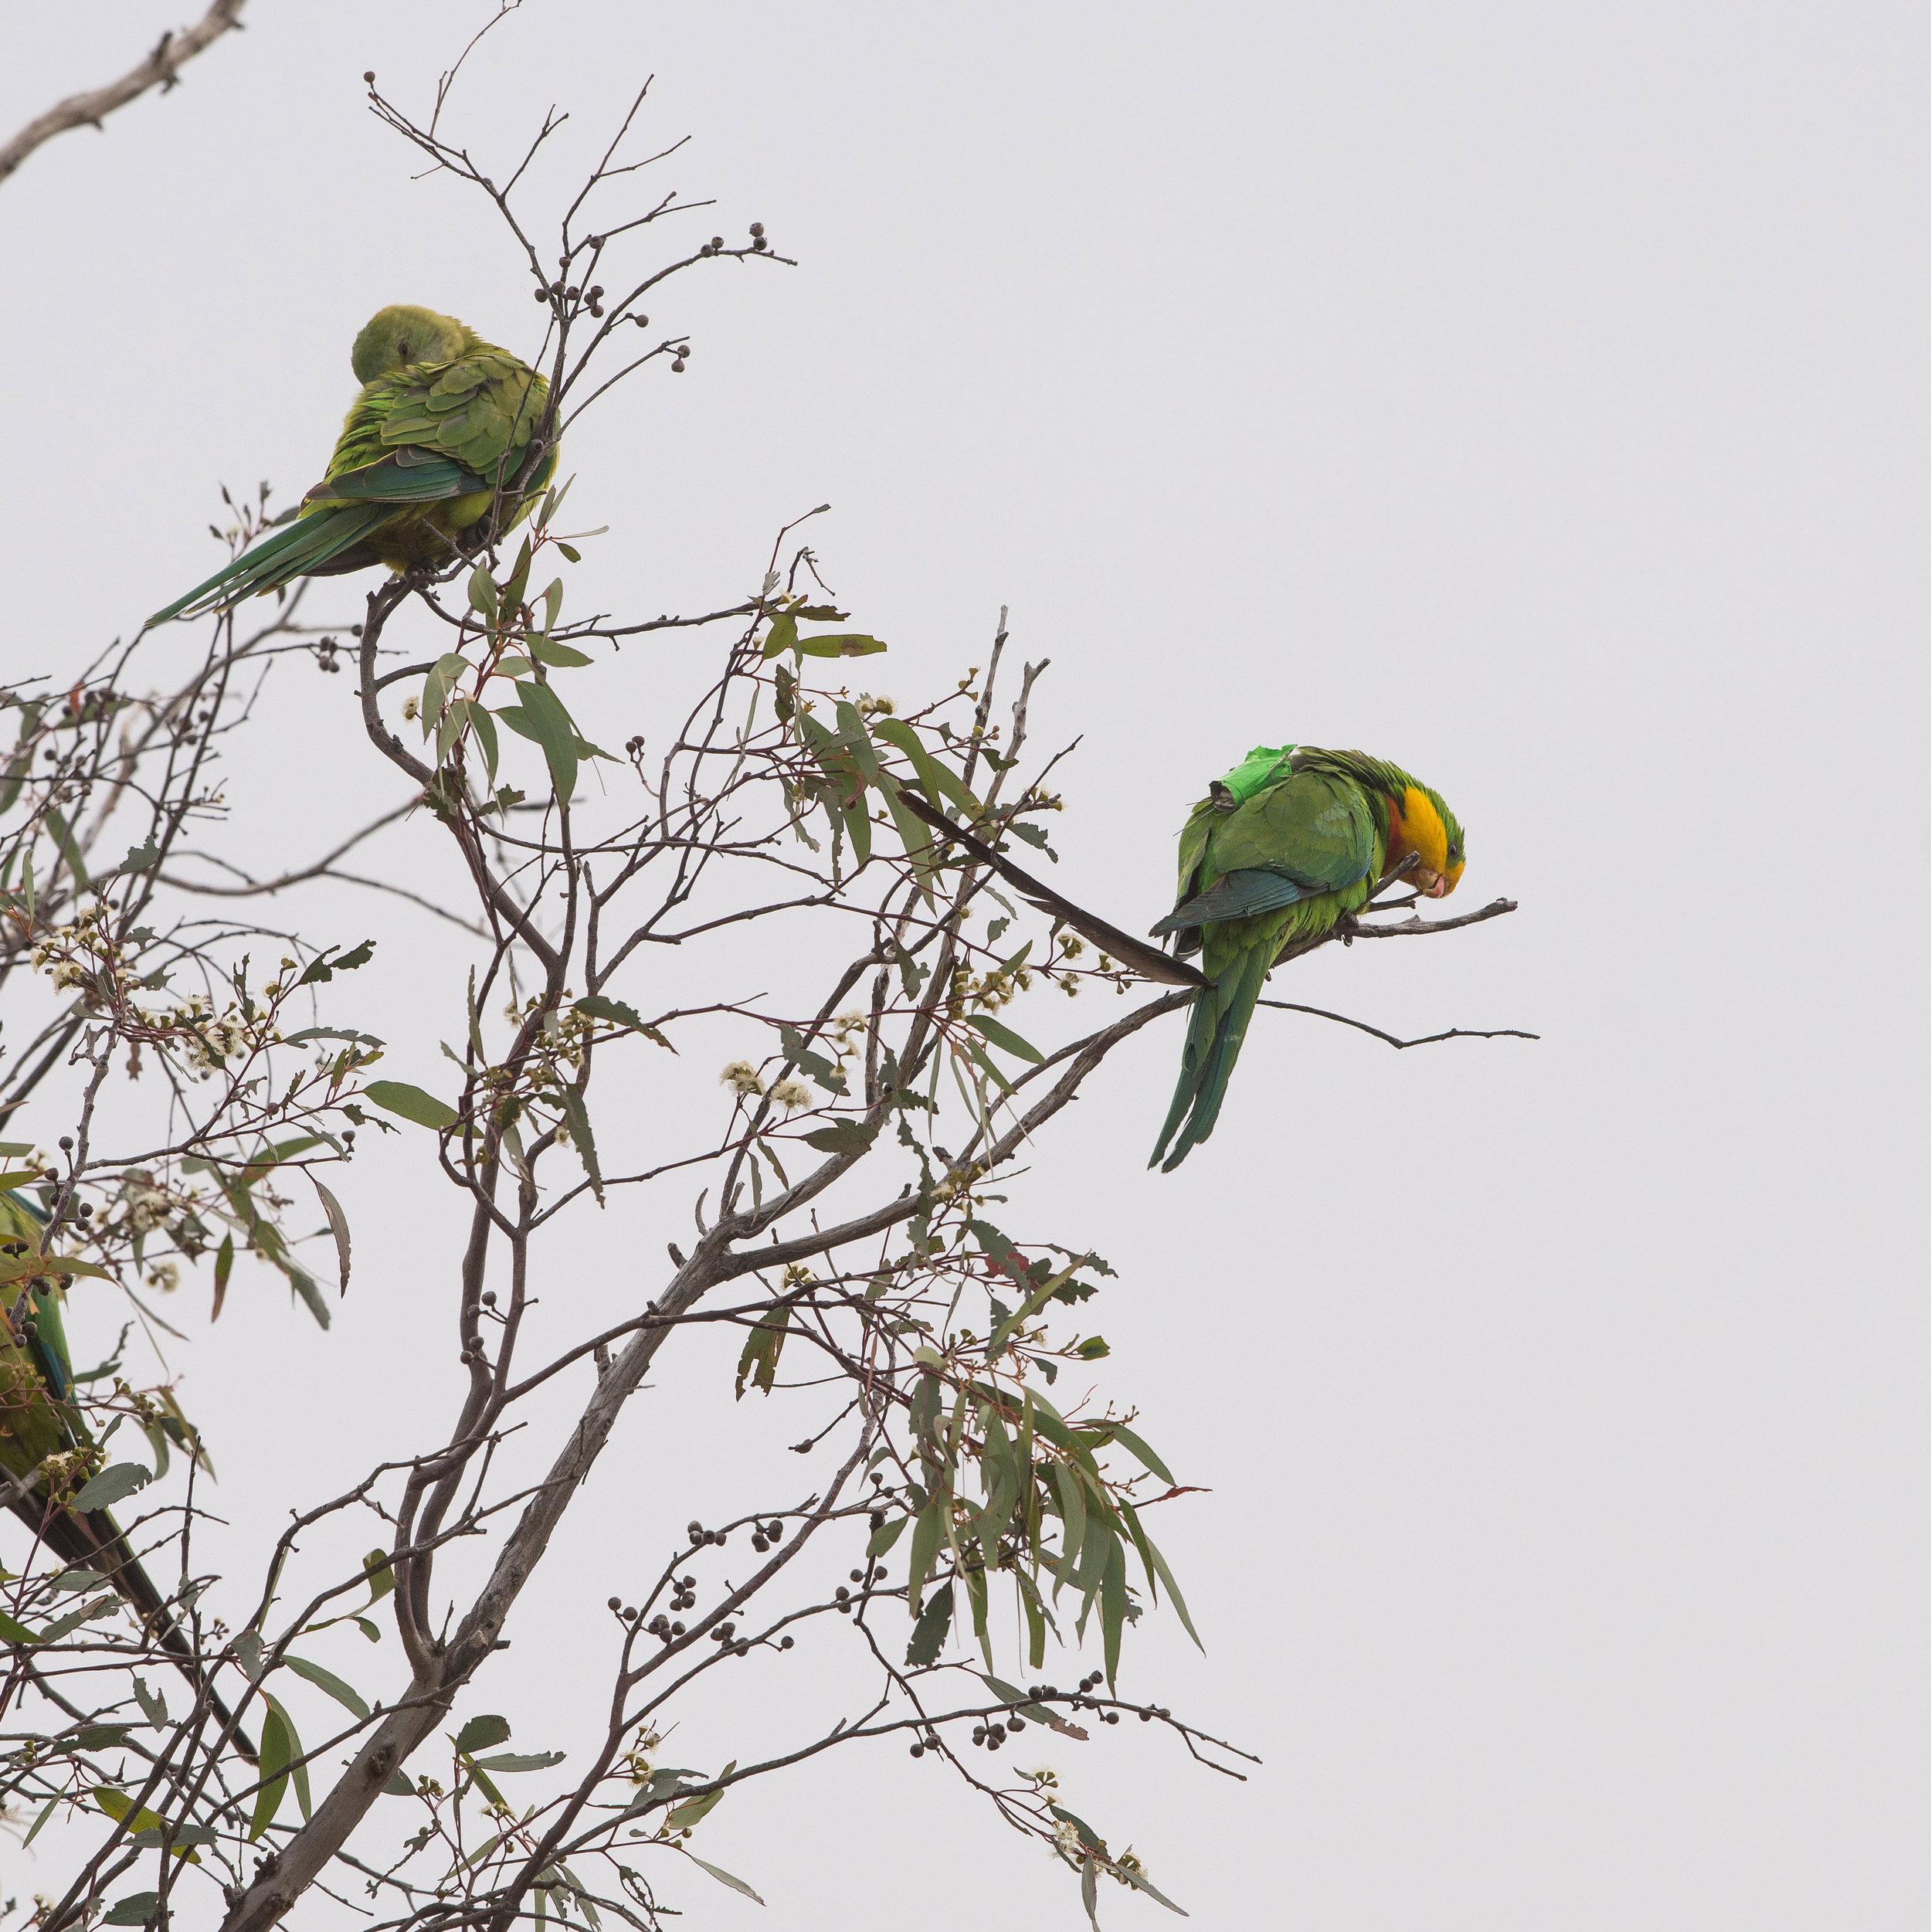 Superb-Parrot-6185.jpg